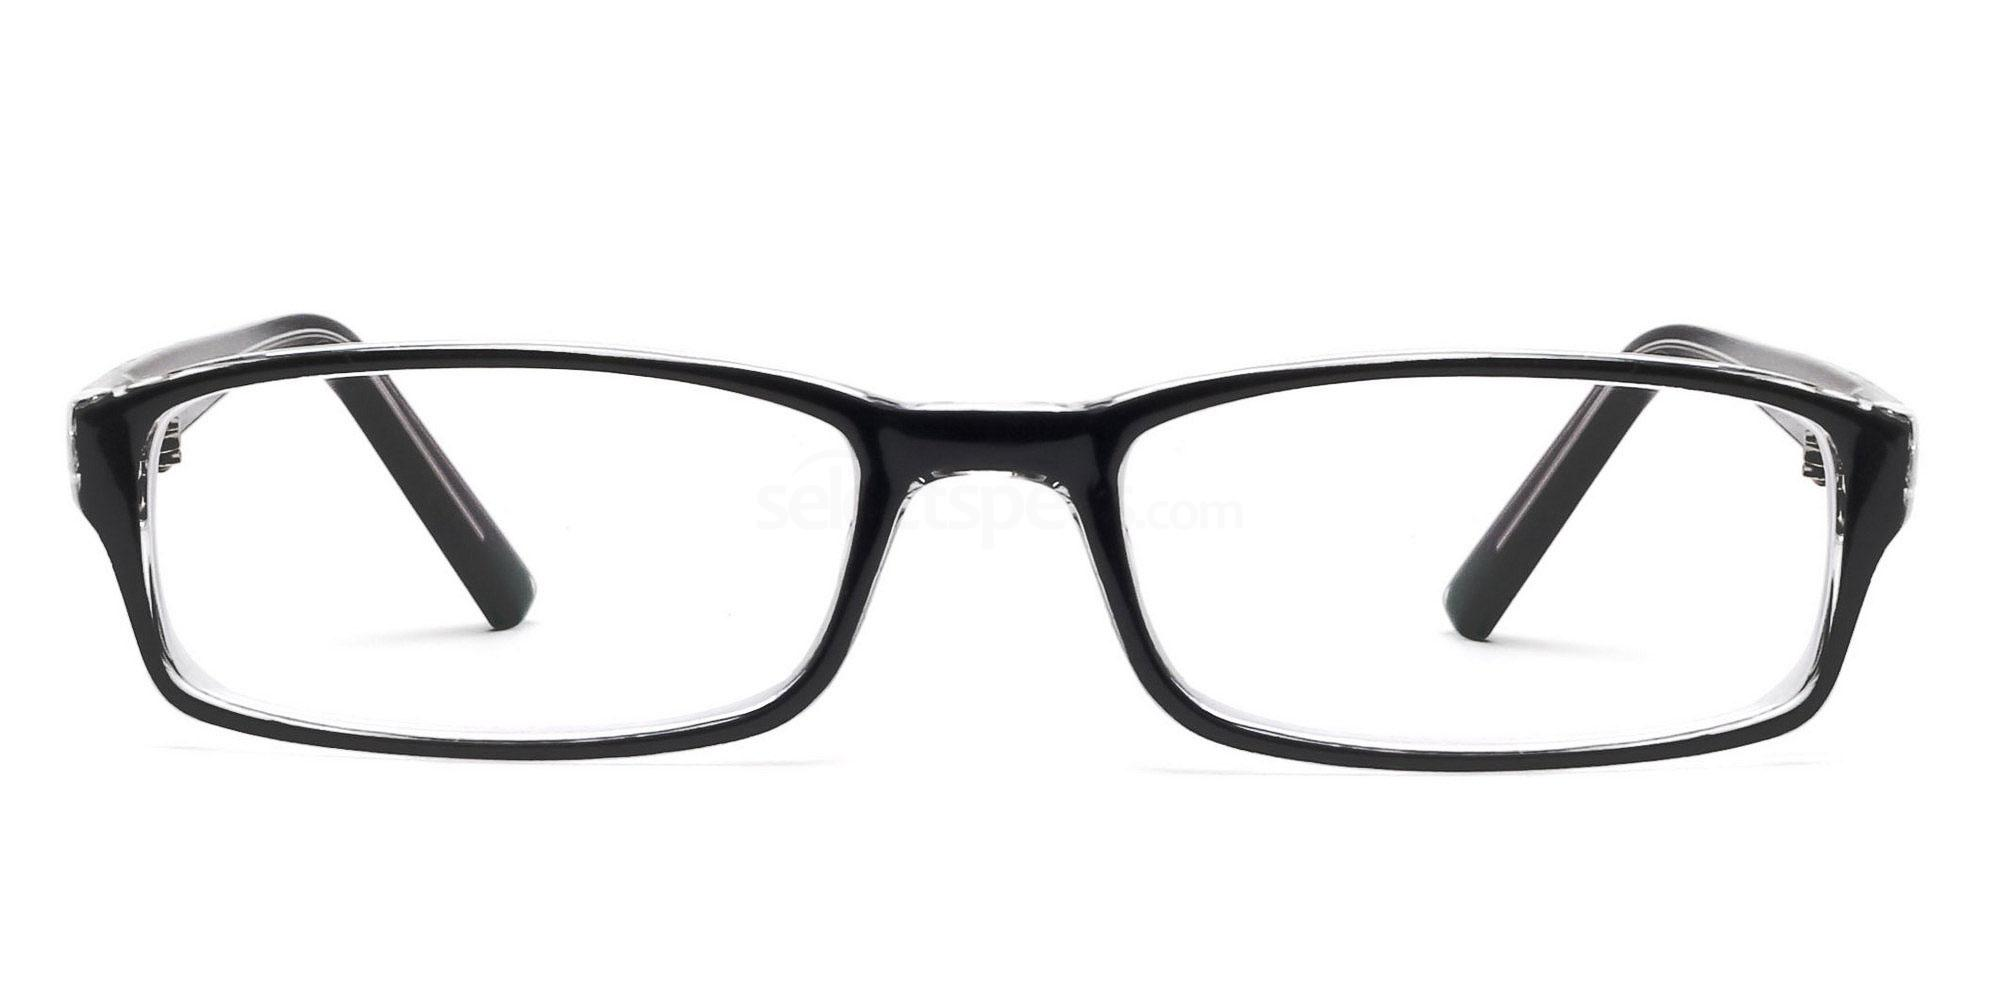 C33 2264 - Black and Clear Glasses, Savannah